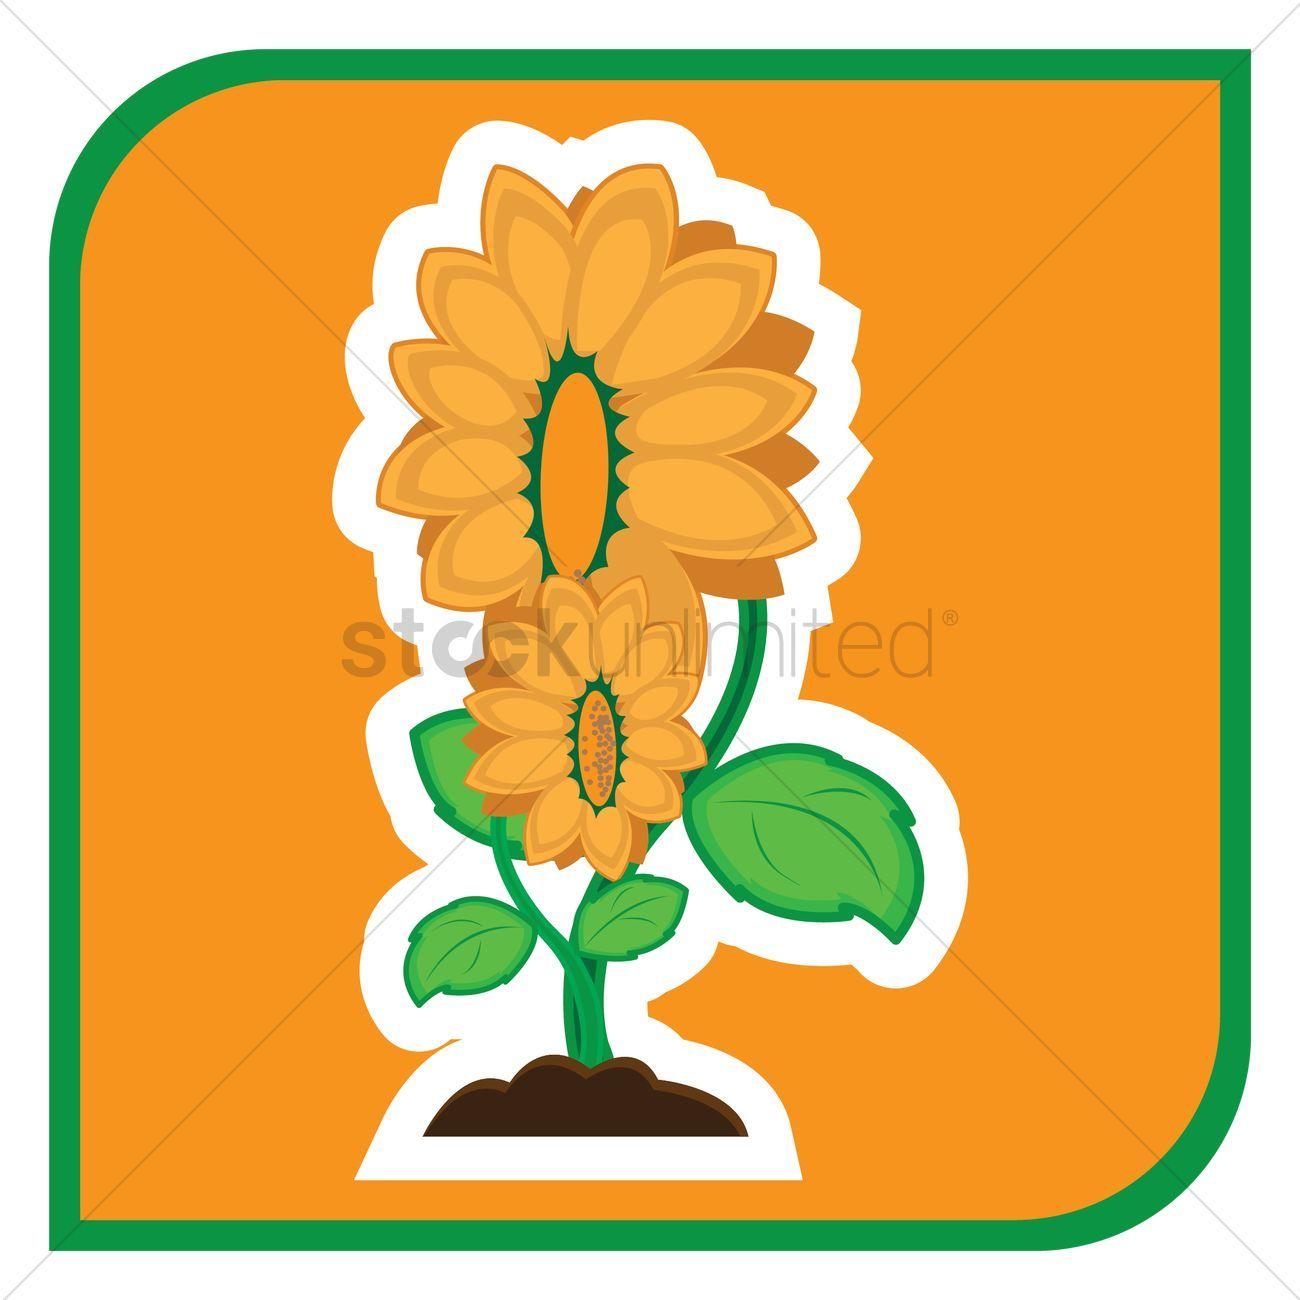 Sunflowers vector illustration